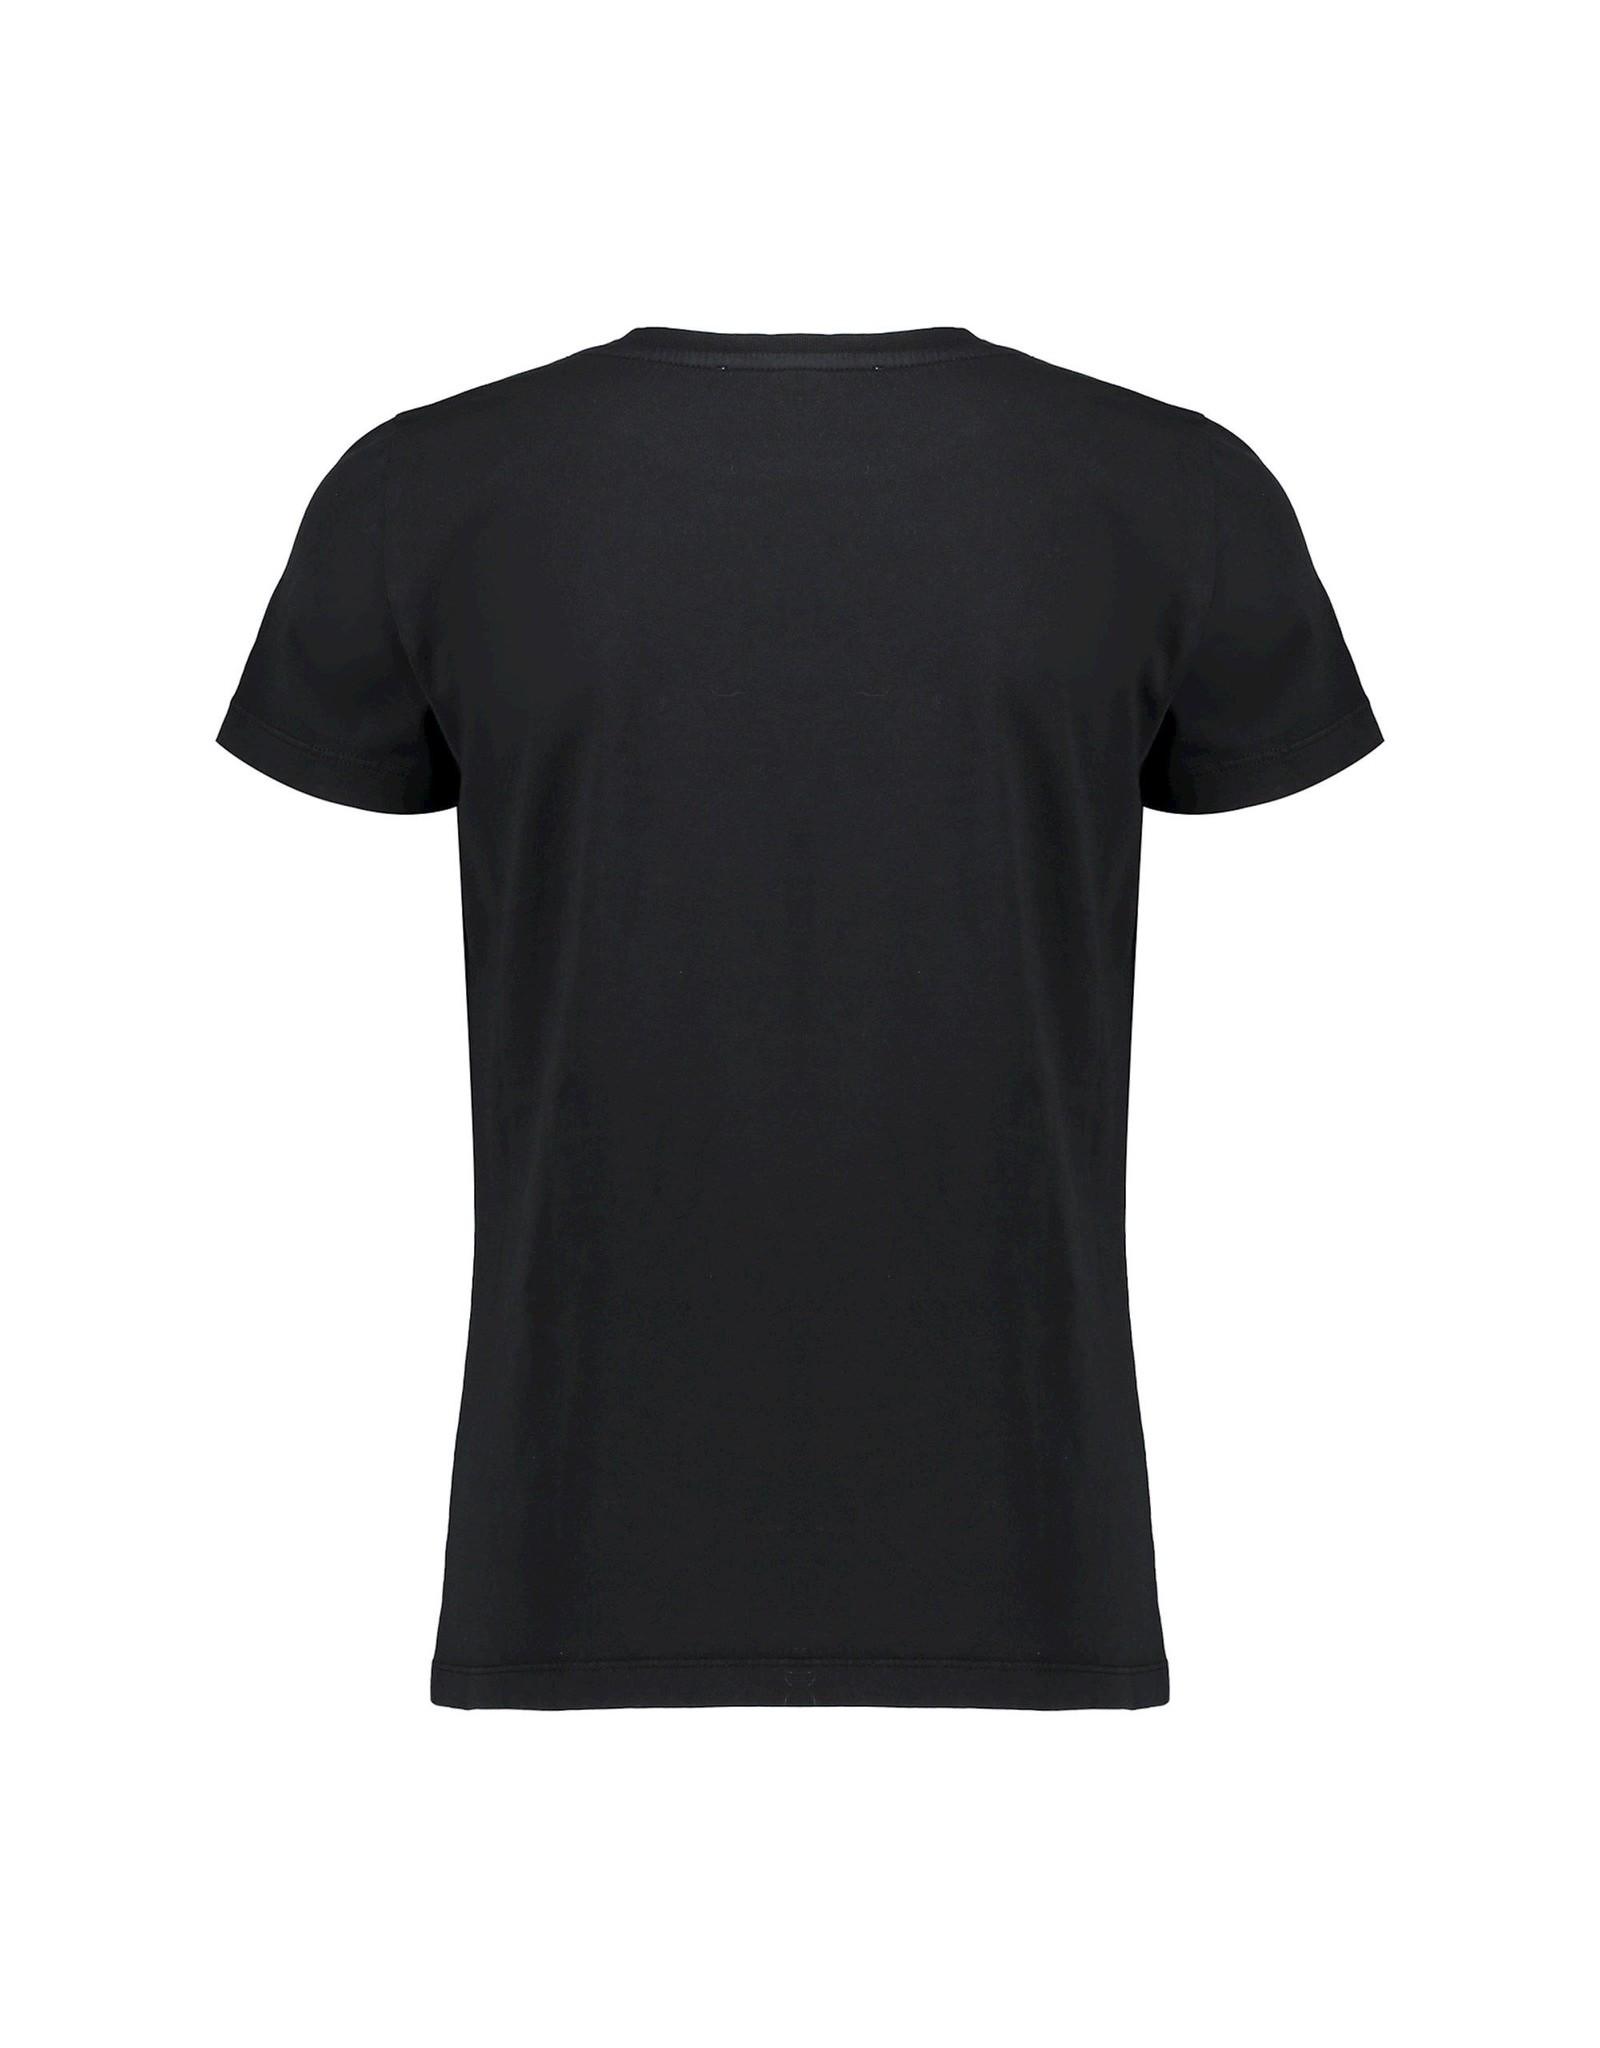 "Geisha T-shirt ""tiger head"" garment dye"